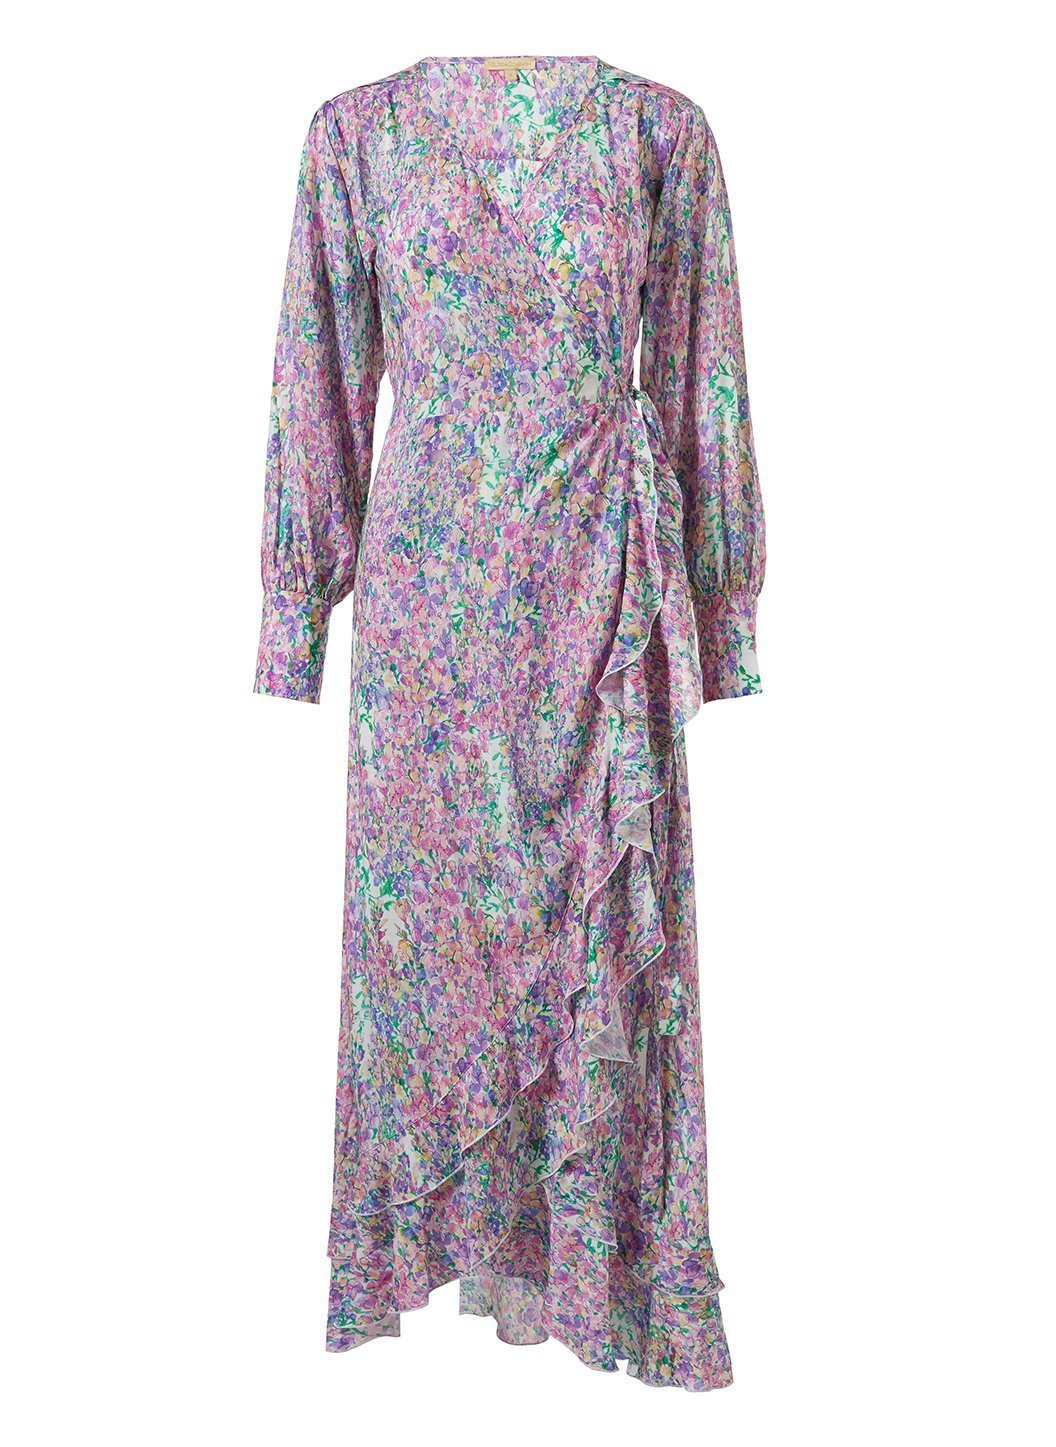 Macaw_Bouquet_Dress_Cutouts_1056x.progressive-3